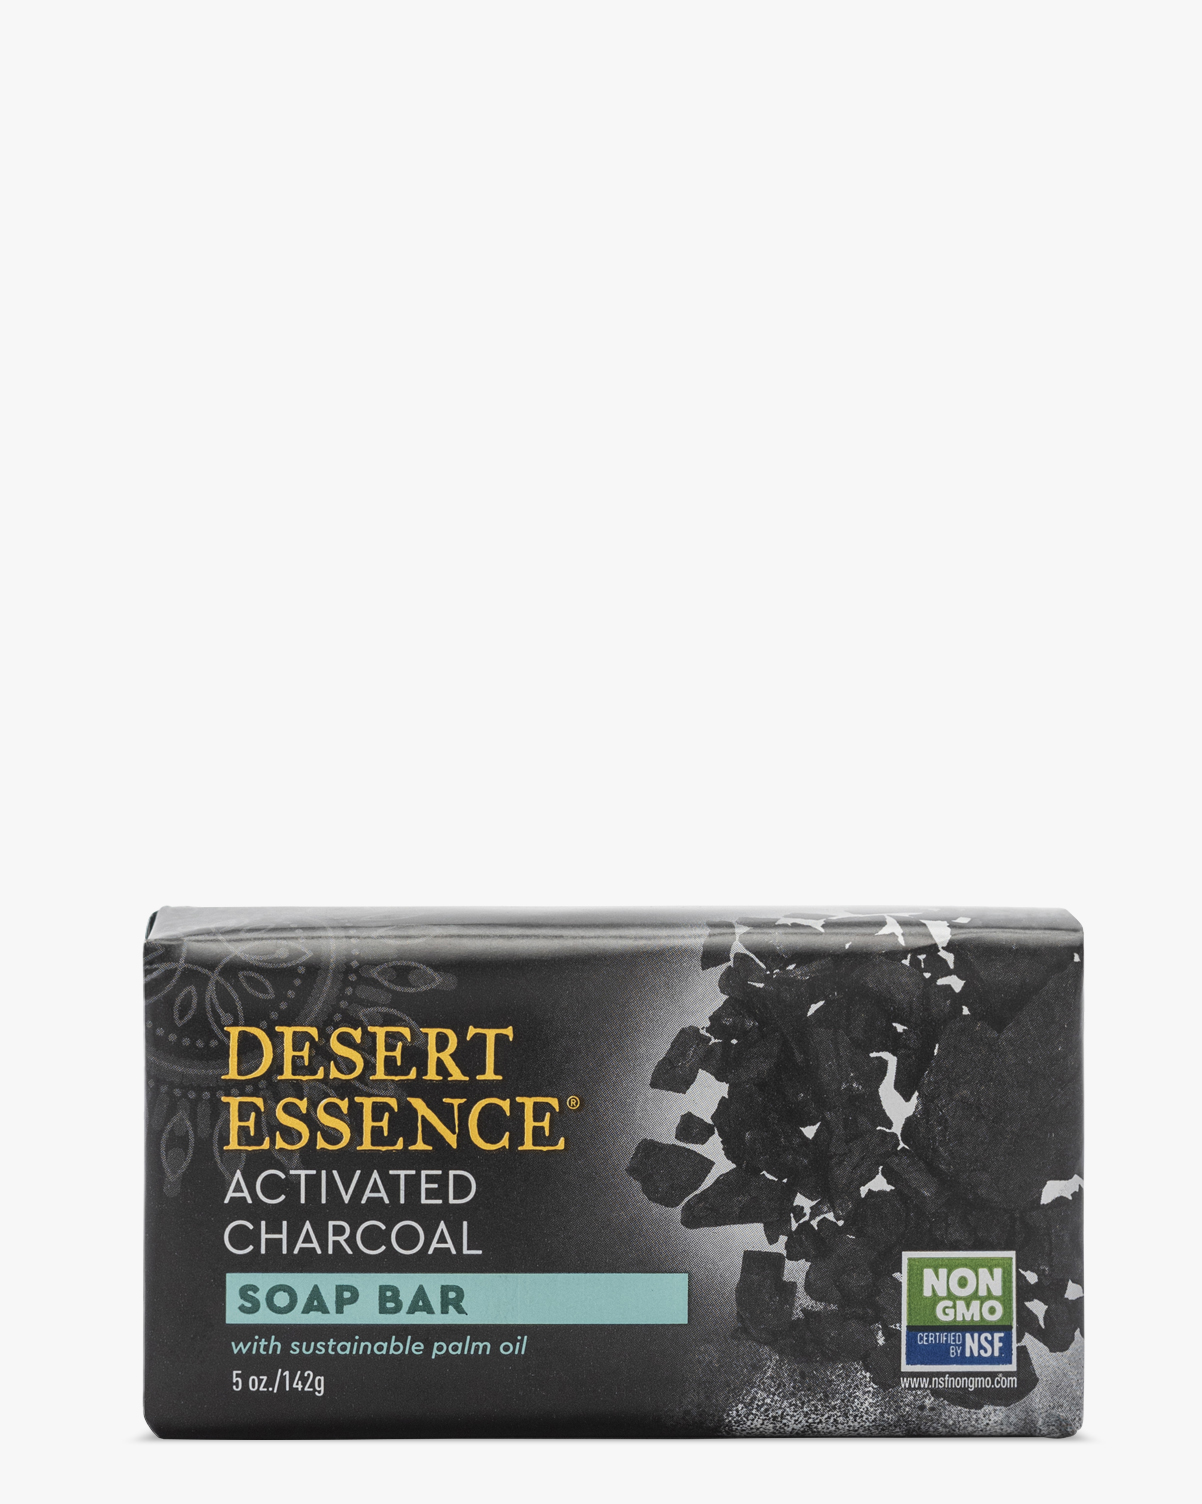 Desert Essence coupon: Desert Essence Activated Charcoal Soap Bar, 5 oz. | Vegan | Gluten-Free